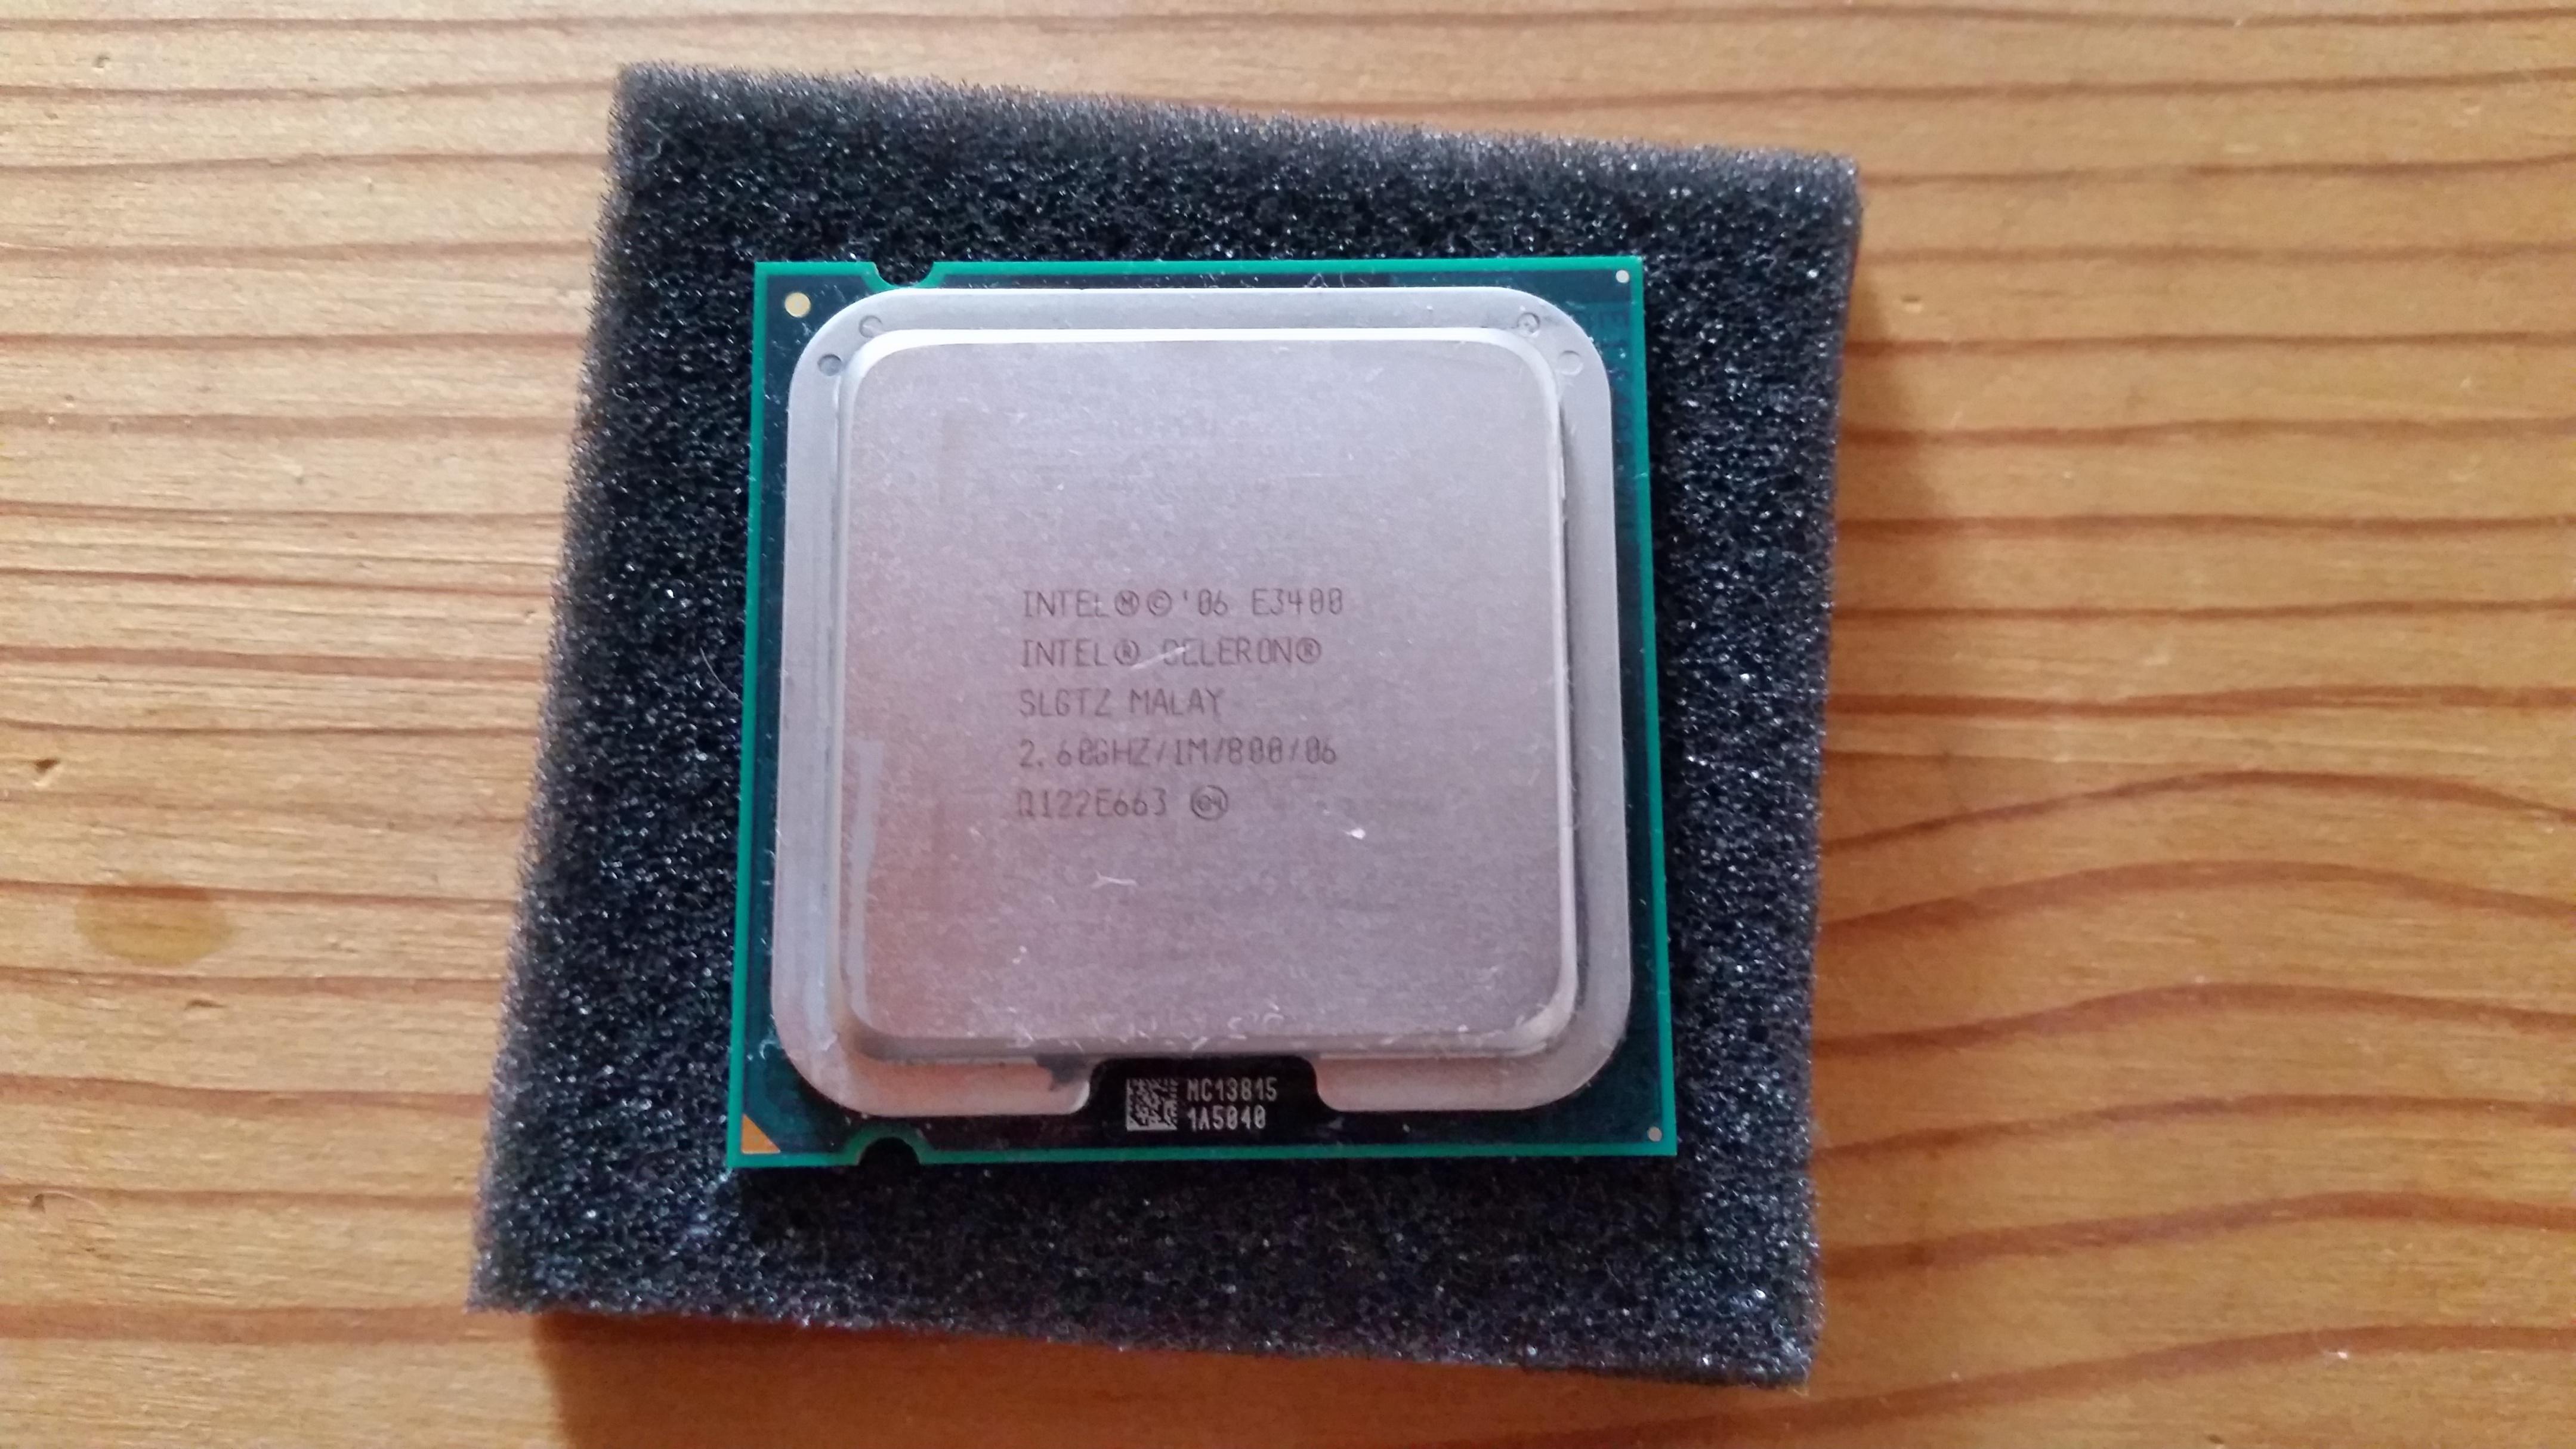 Intel Celeron Dual Core (Wolfdale) Sockel 775